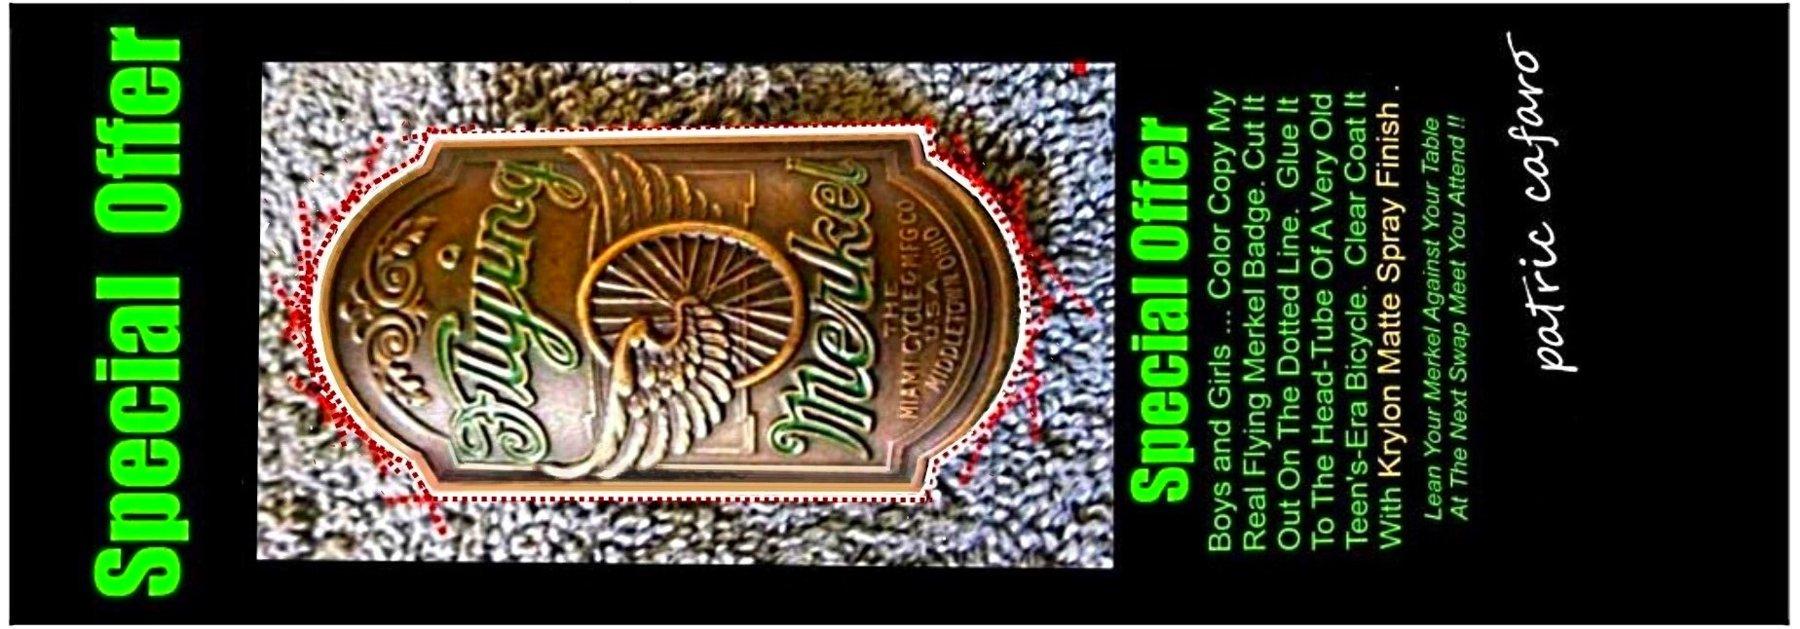 flying merkel badge MASTER COPY Coupon.jpg